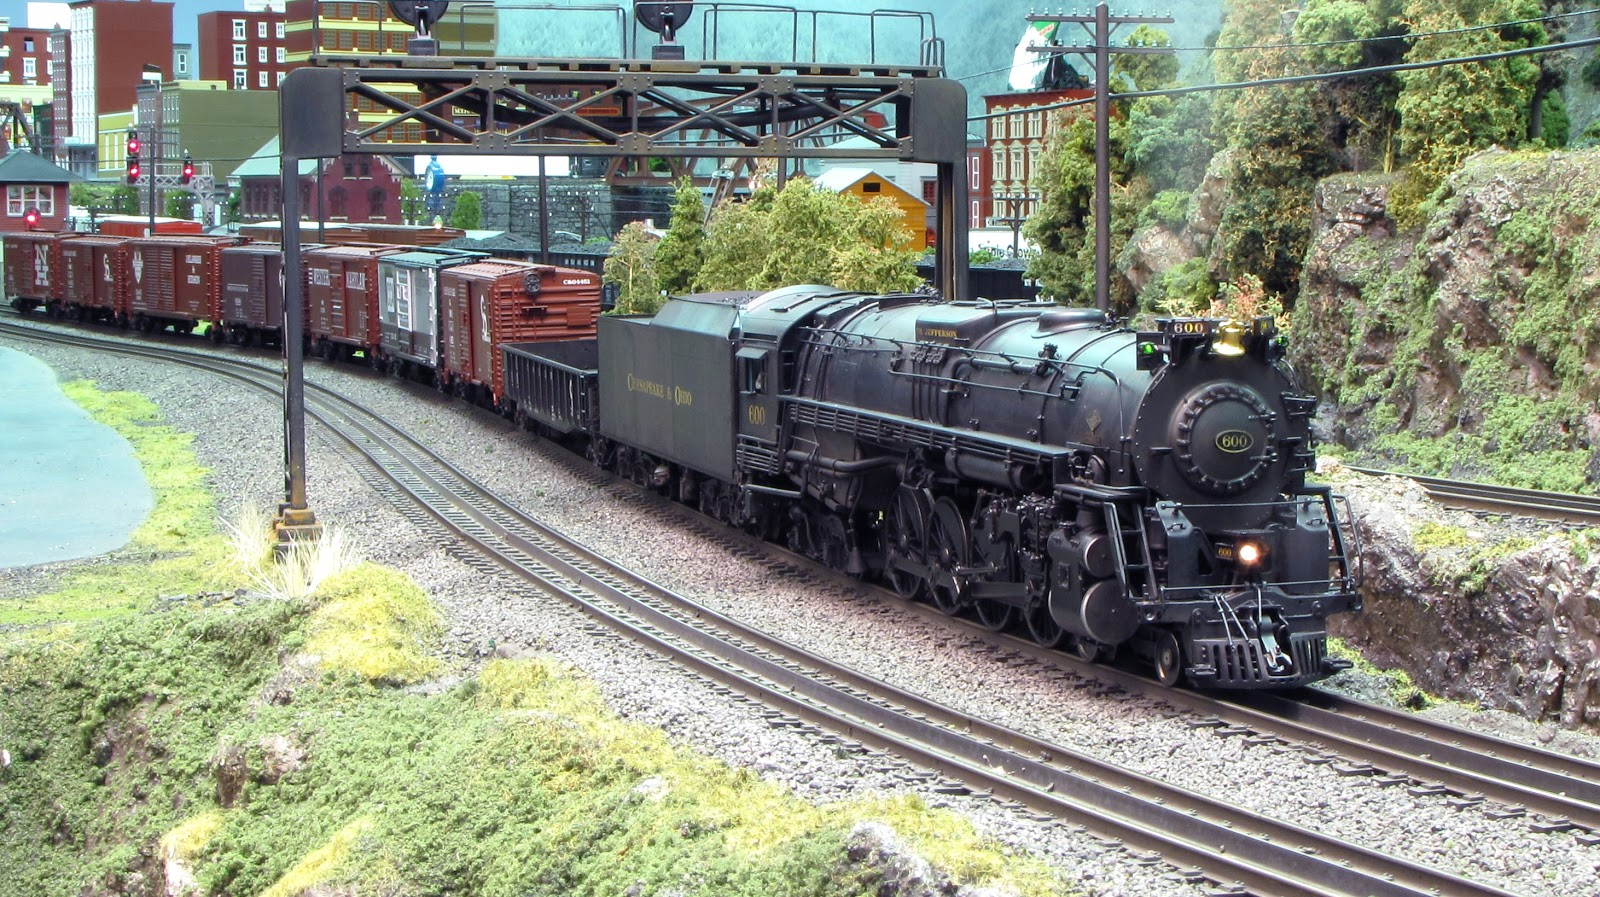 Used Cars Spartanburg Sc >> Hi rail description - Model Railroader Magazine - Model ...